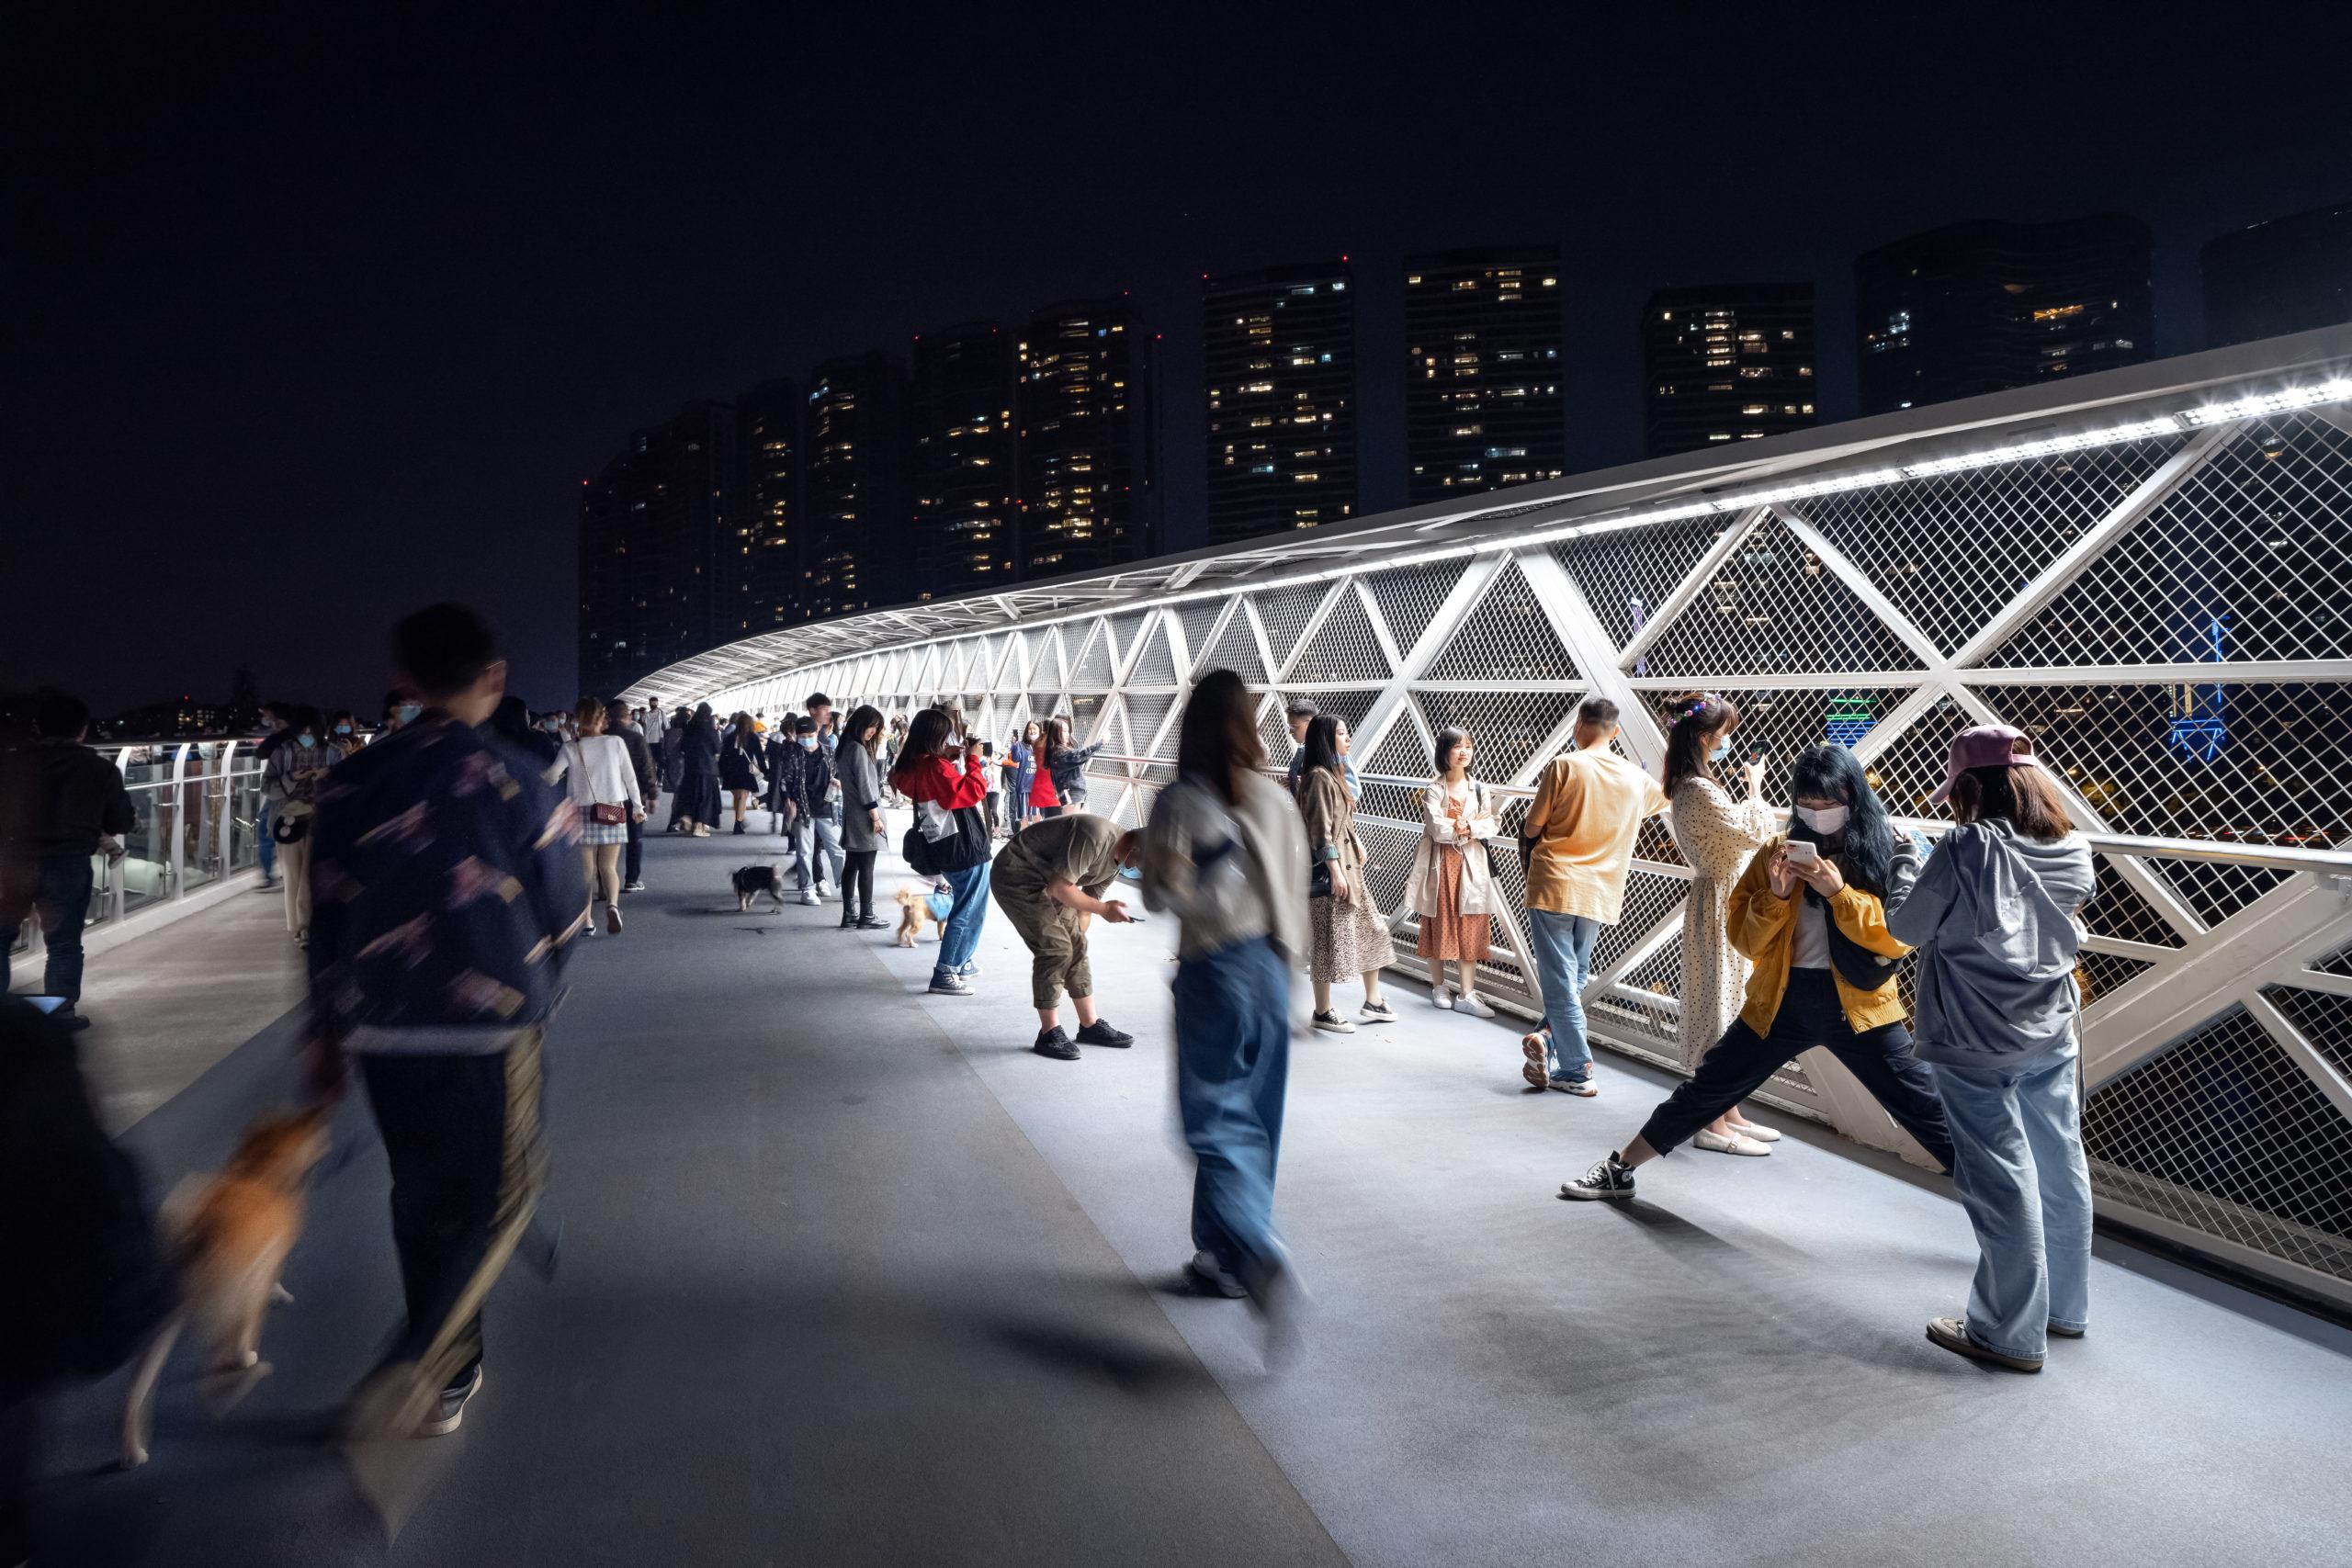 五岔子大橋 Wuchazi Bridge night view showing people on the bridge